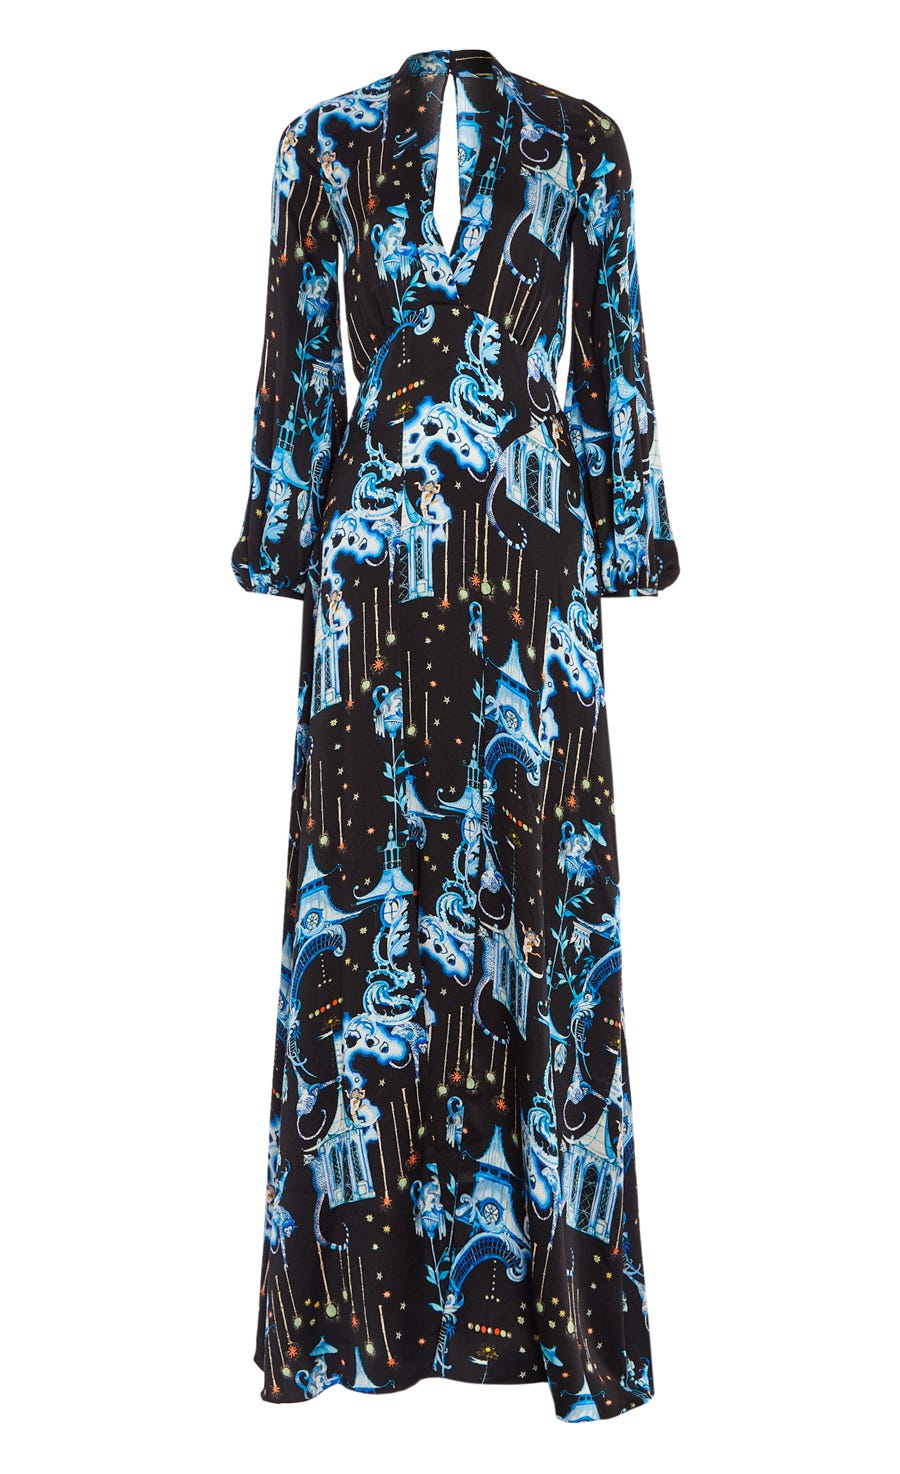 Euphoria Sleeved Gown